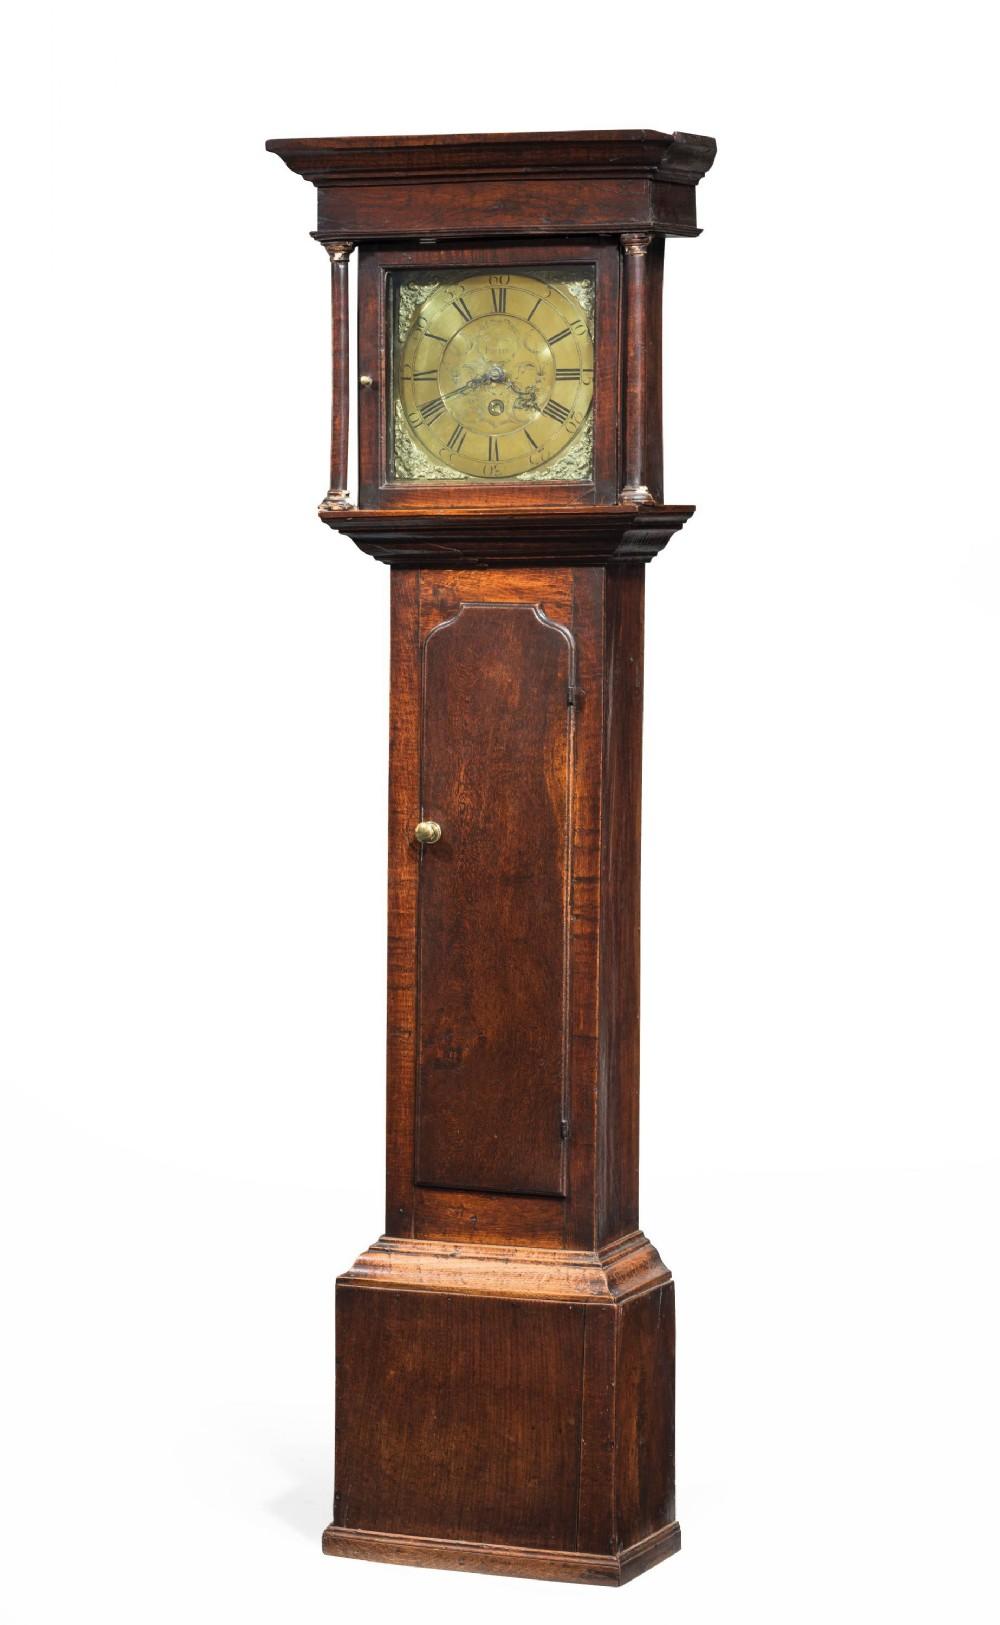 george iii period oak longcase clock by e foster of carlisle